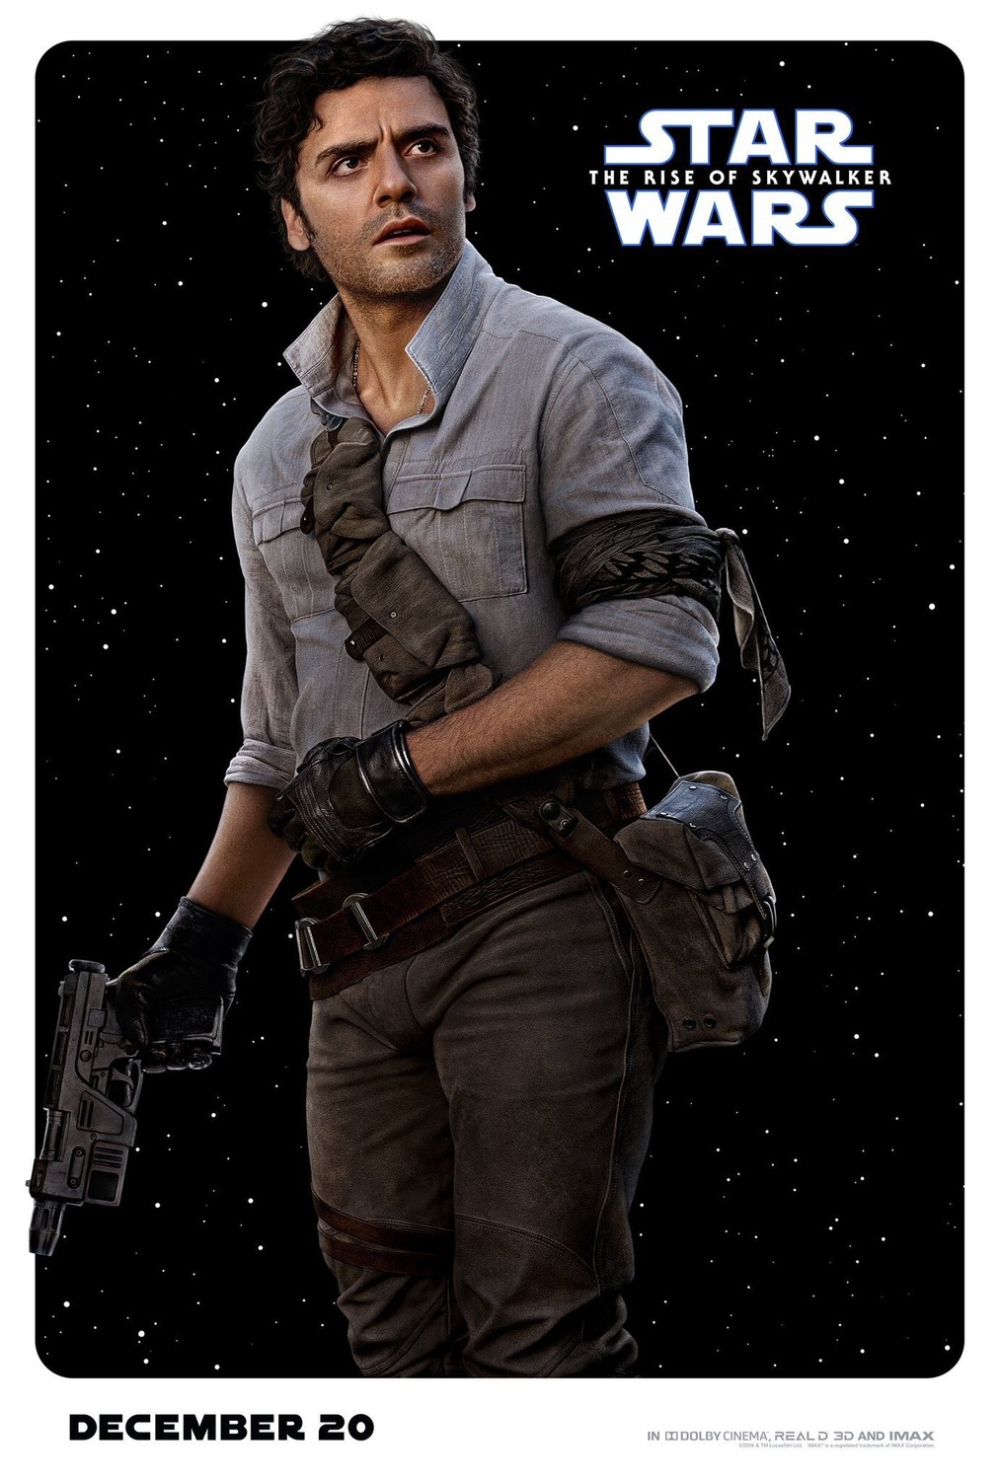 Star Wars The Rise Of Skywalker Poe Dameron Star Wars Watch New Star Wars Star Wars Episodes